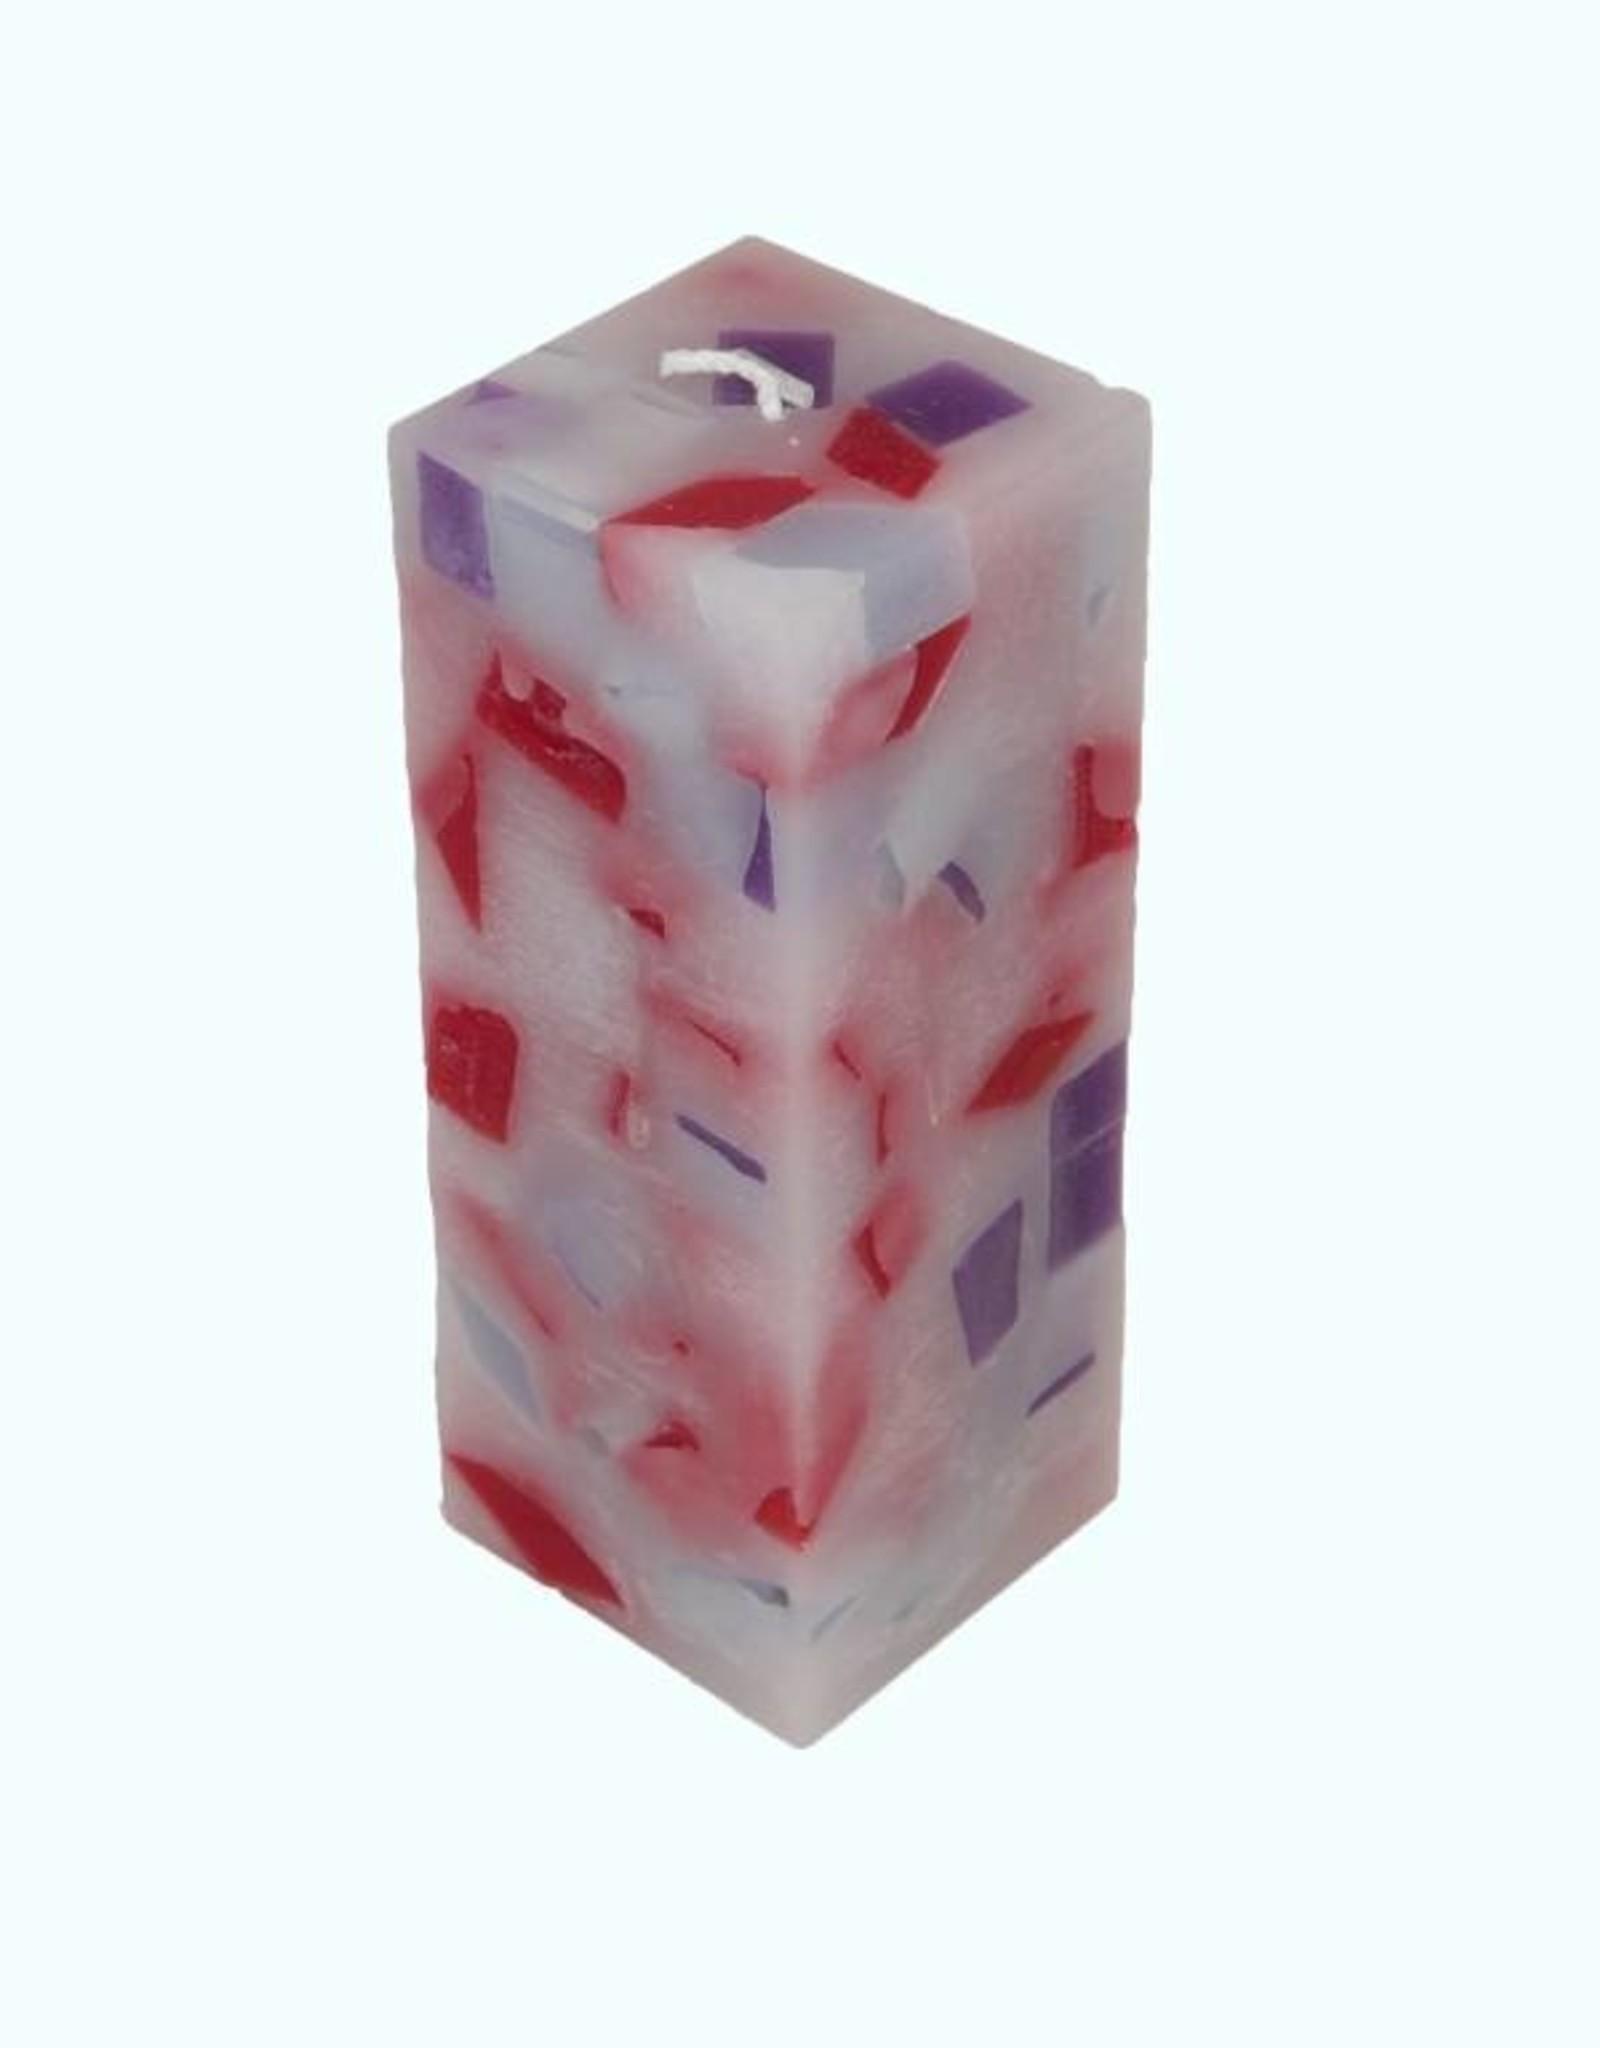 Mozaïek Kaars Vierkant Rood-Paars-Kobalt blauw 6x6x16 cm